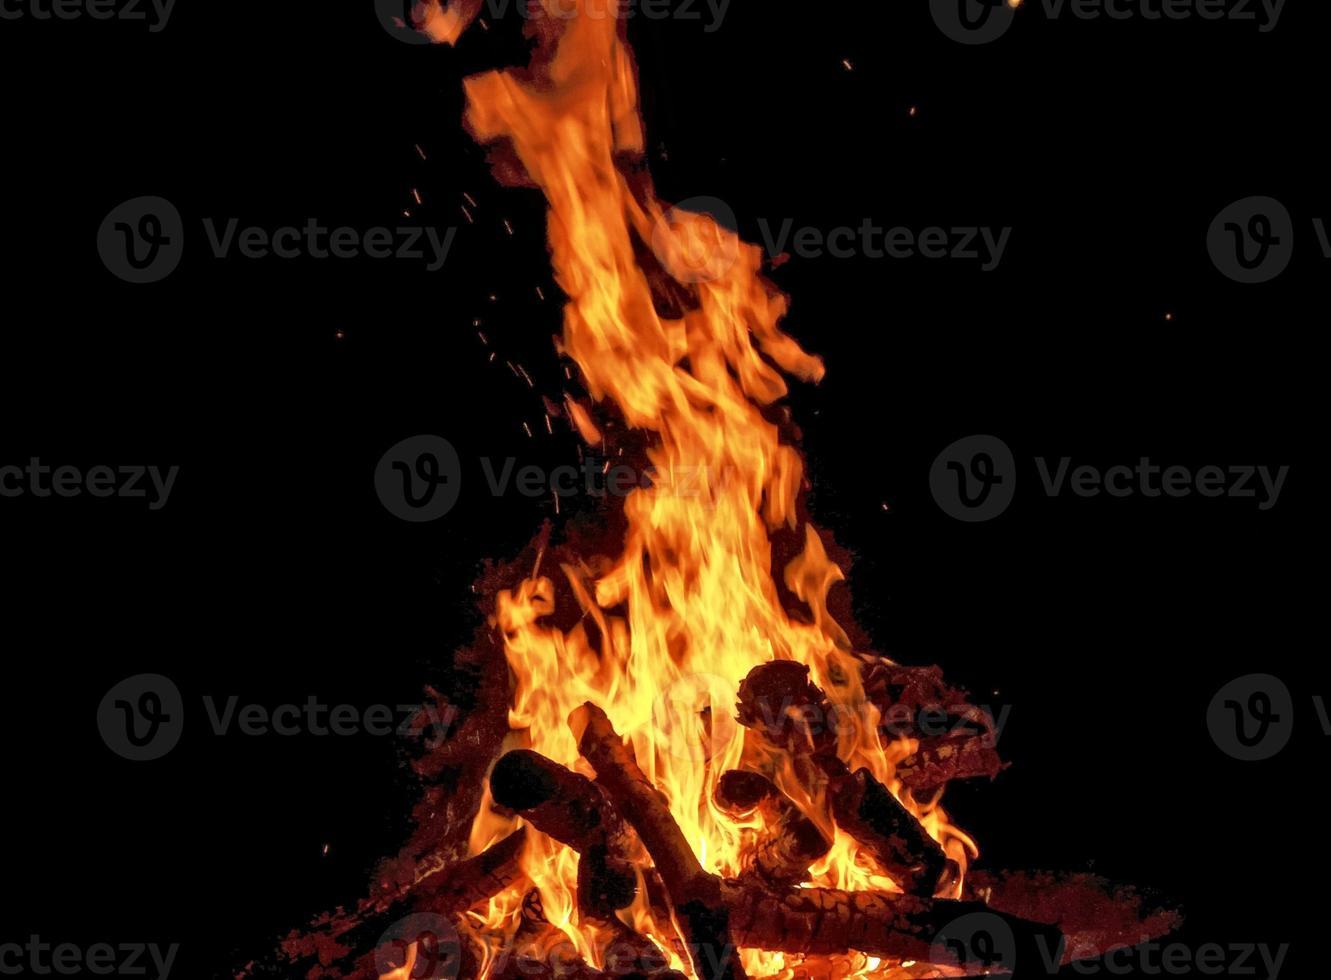 Fire in Winter - Night photo